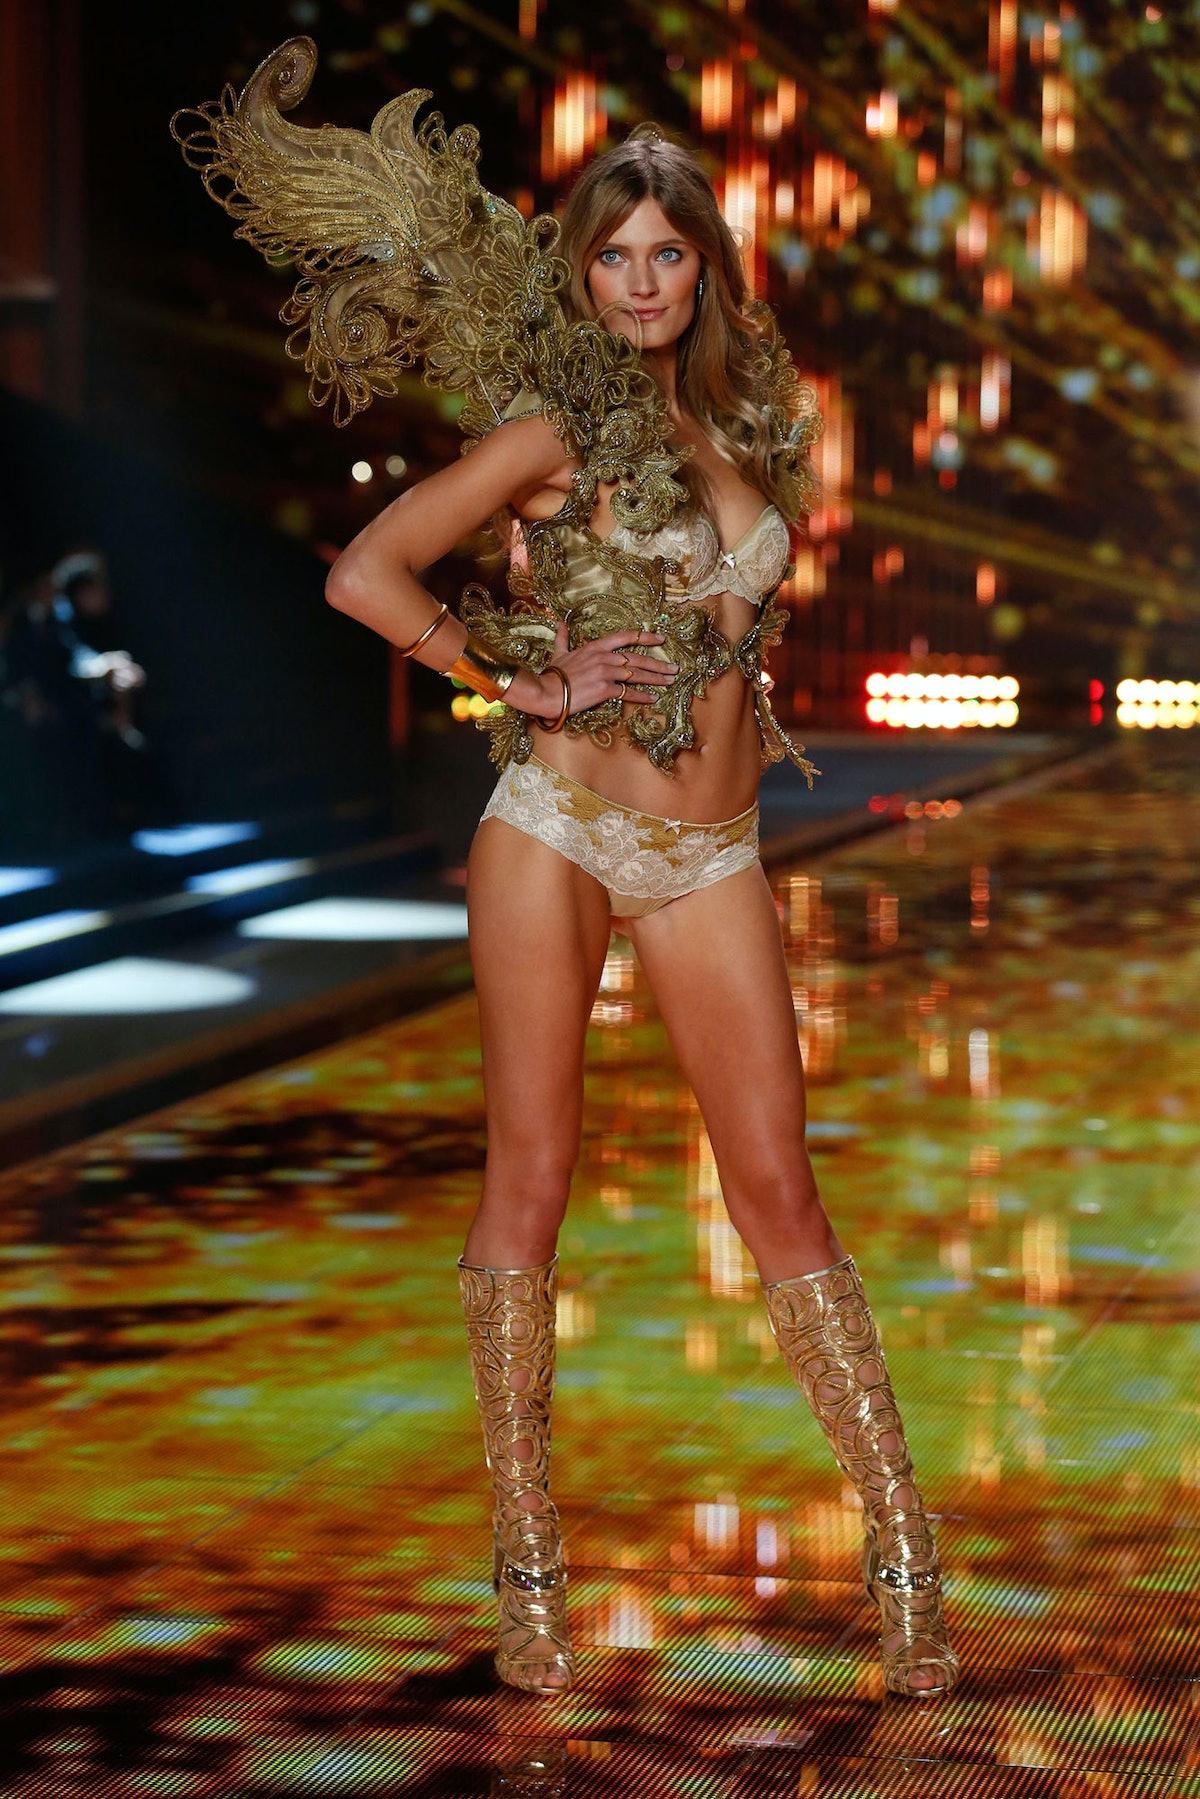 Constance Jablonski walks in the 2014 Victoria's Secret Fashion Show